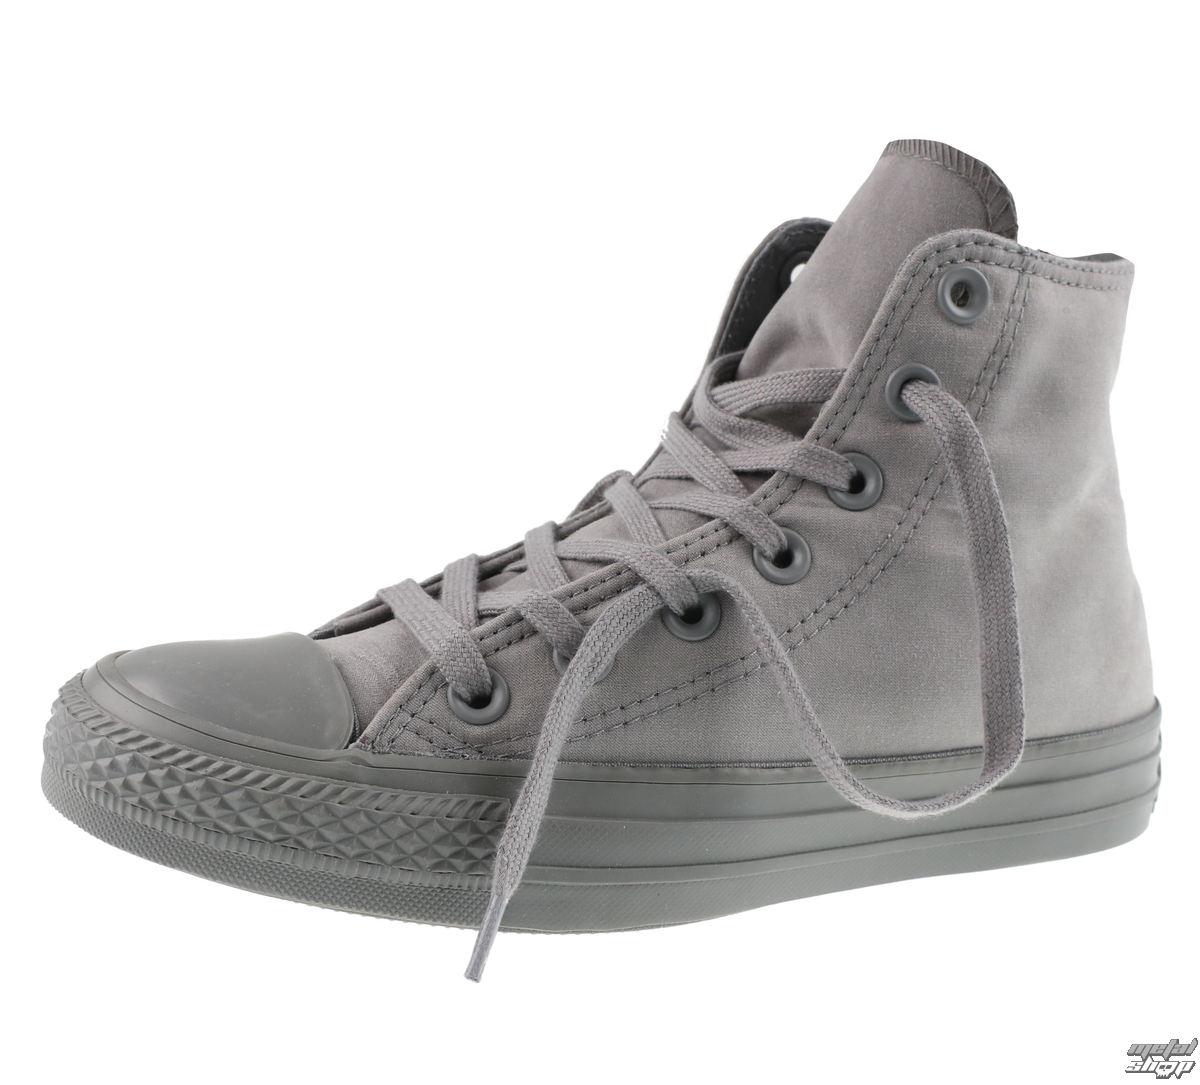 Herren High Top Sneakers Chuck Taylor All Star CONVERSE